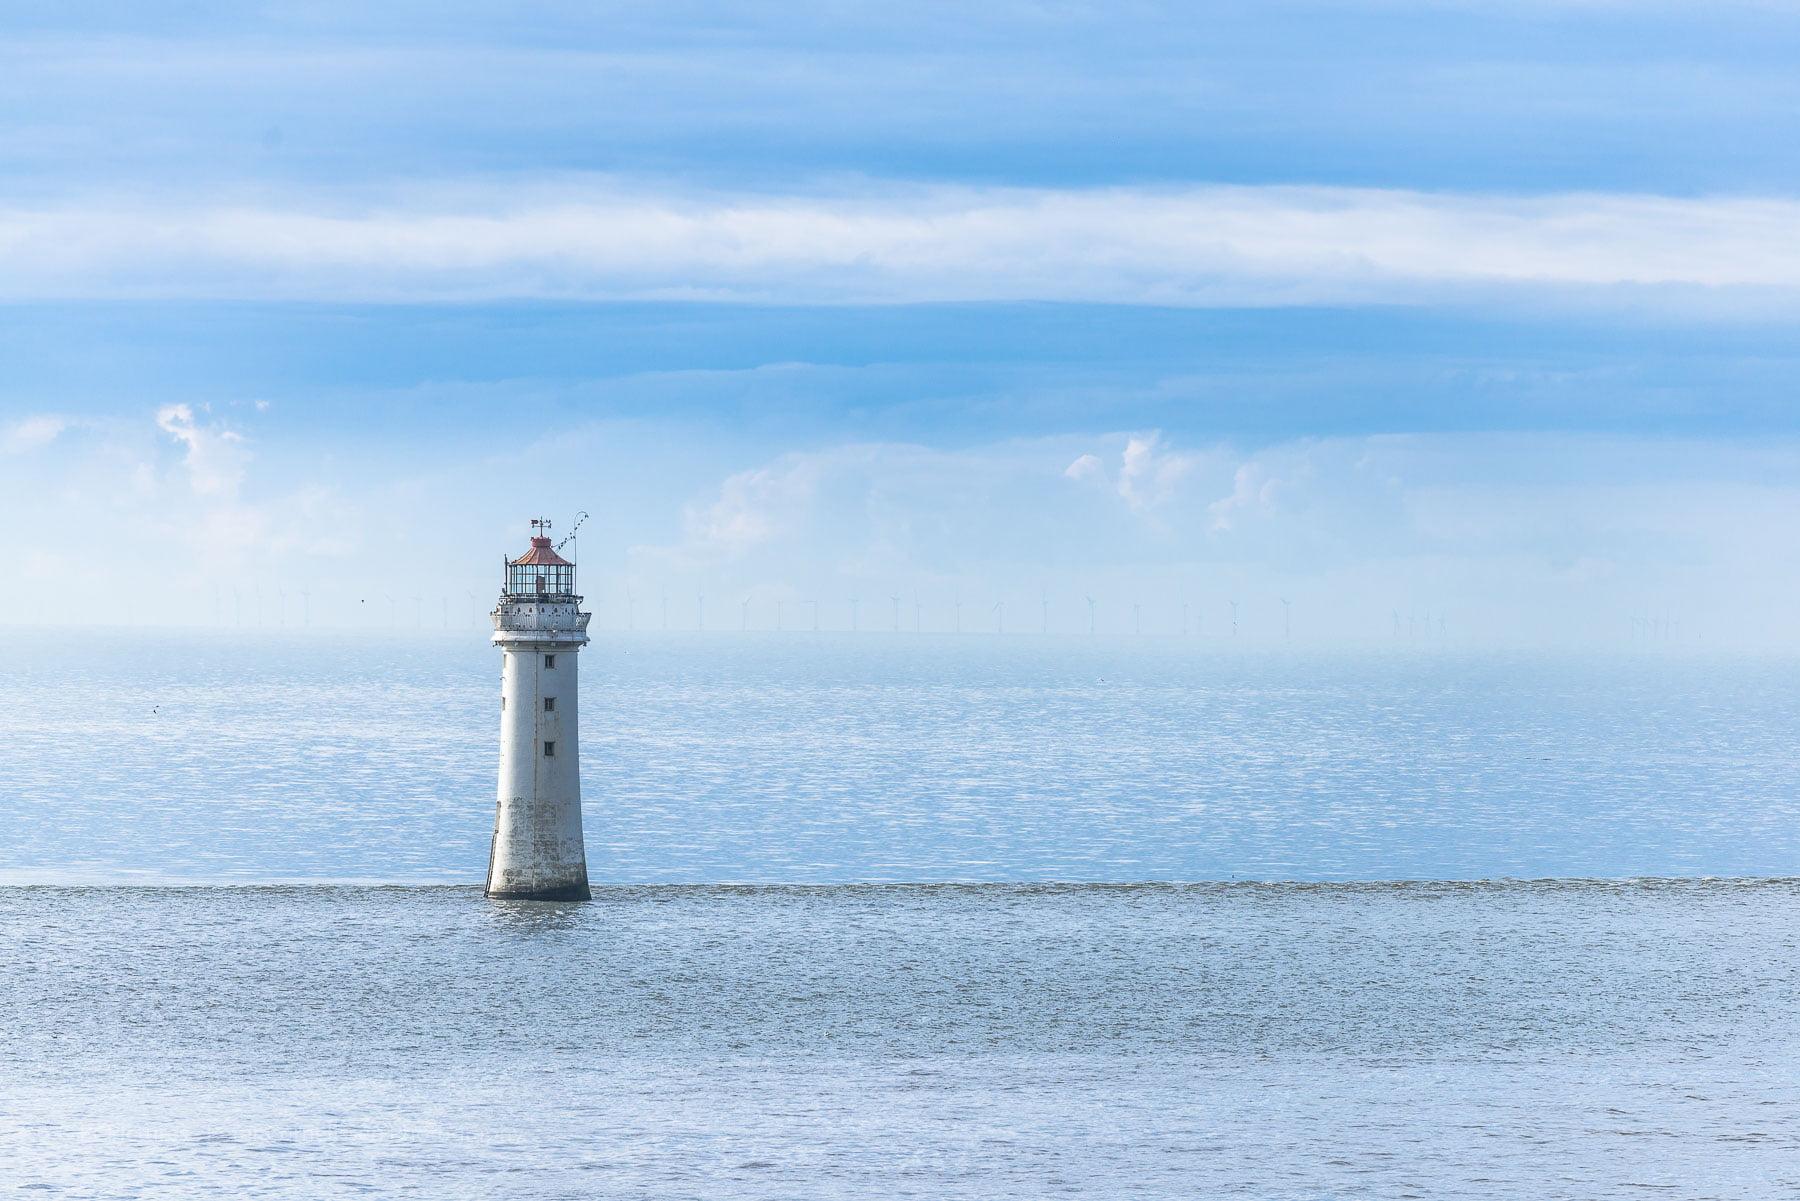 Foto catagoriëen, Seascape, Shutterstock, Stock Photography, Stock fotografie, zeegezicht